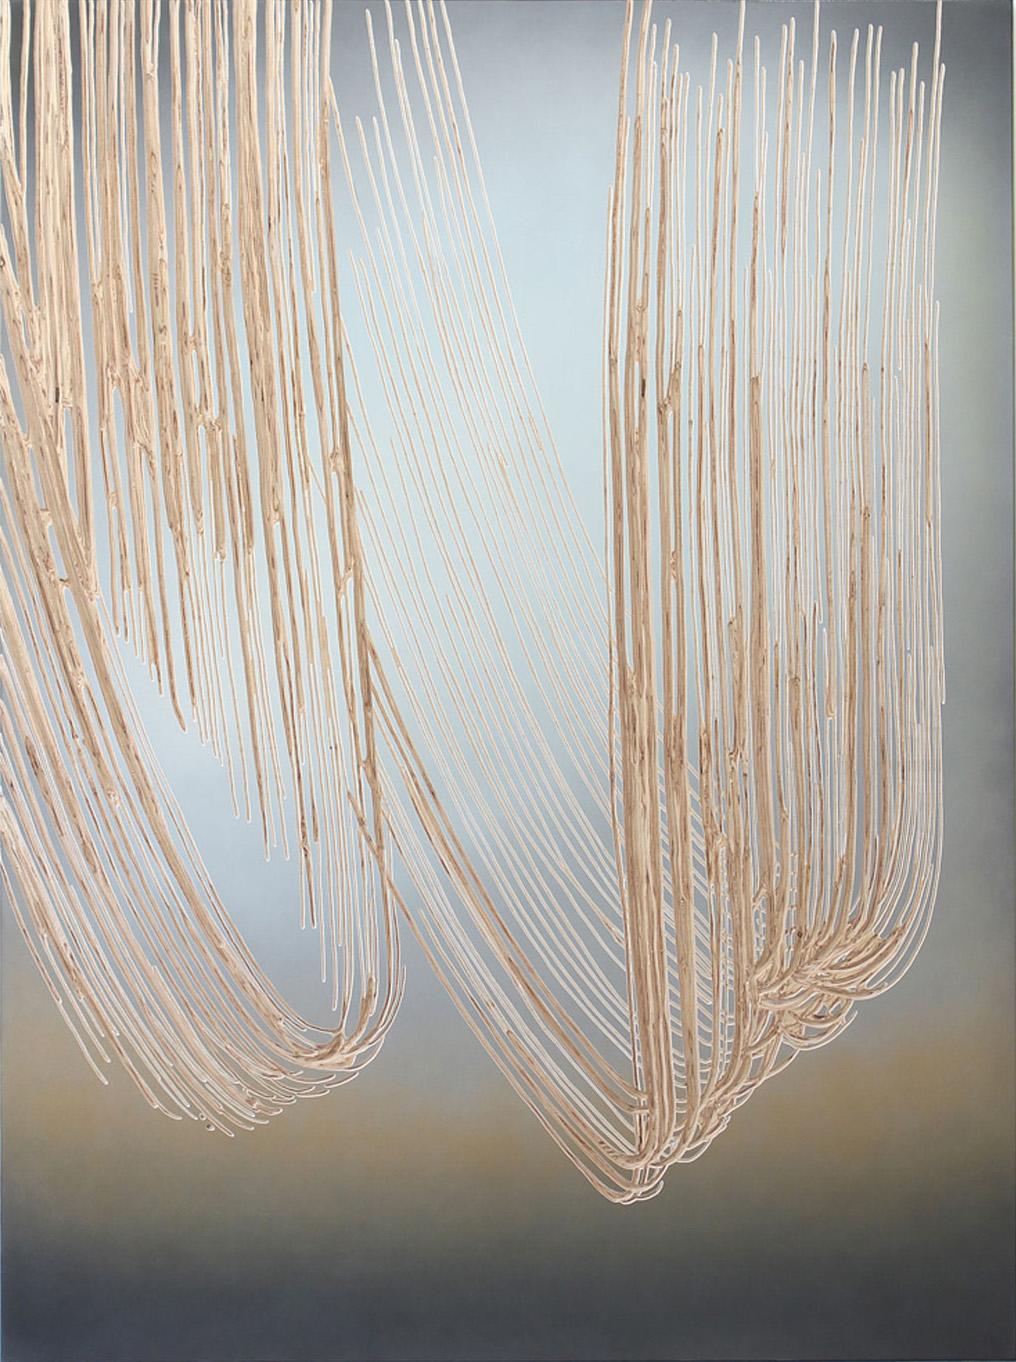 2017 o.T.  190 x 140 x 4 cm  fade broom